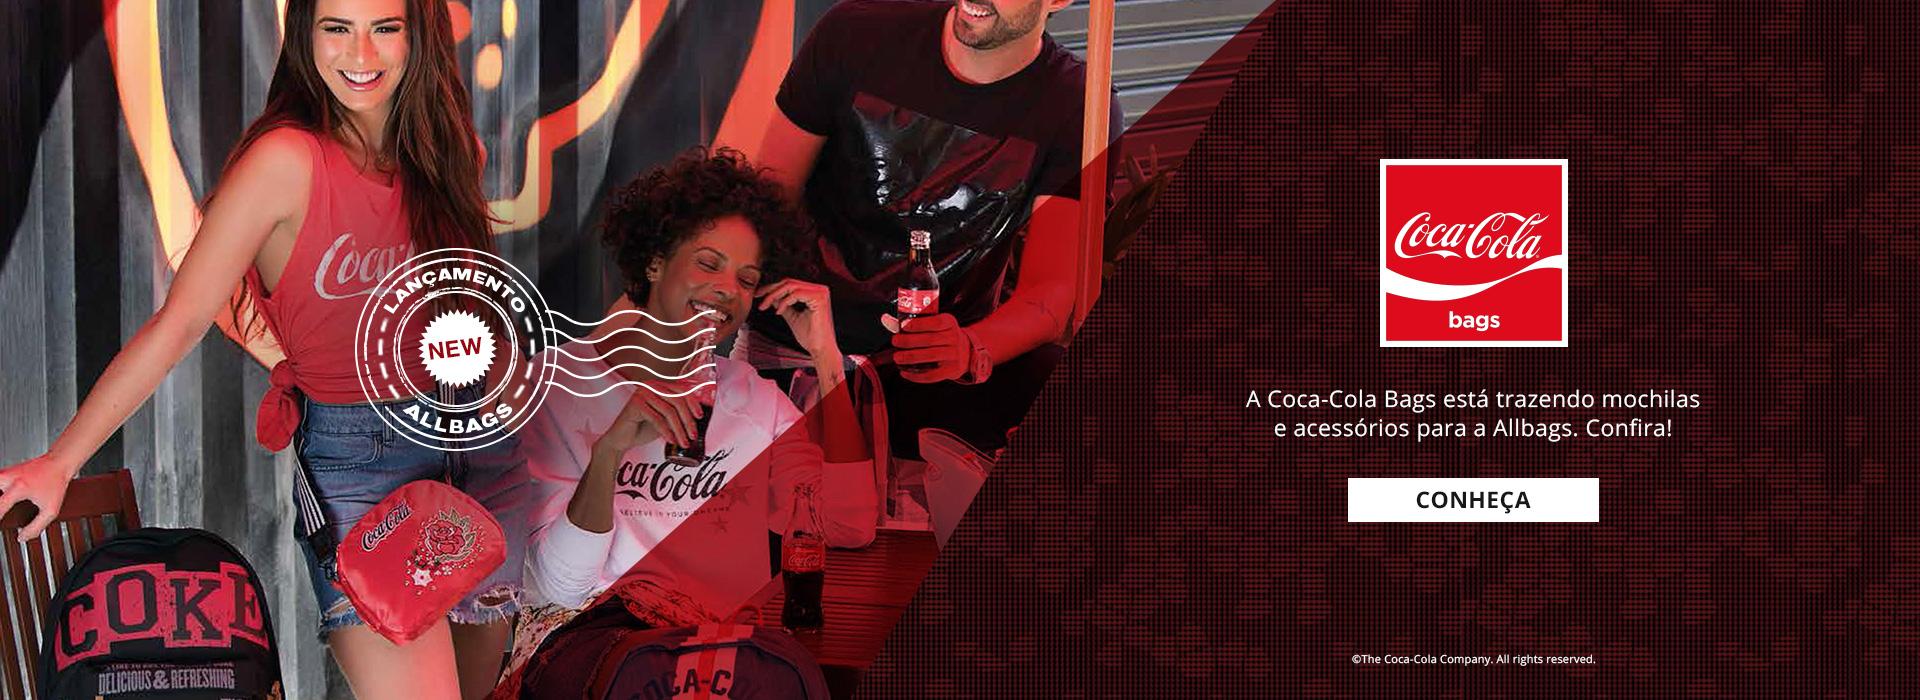 Banner 3 - Coca